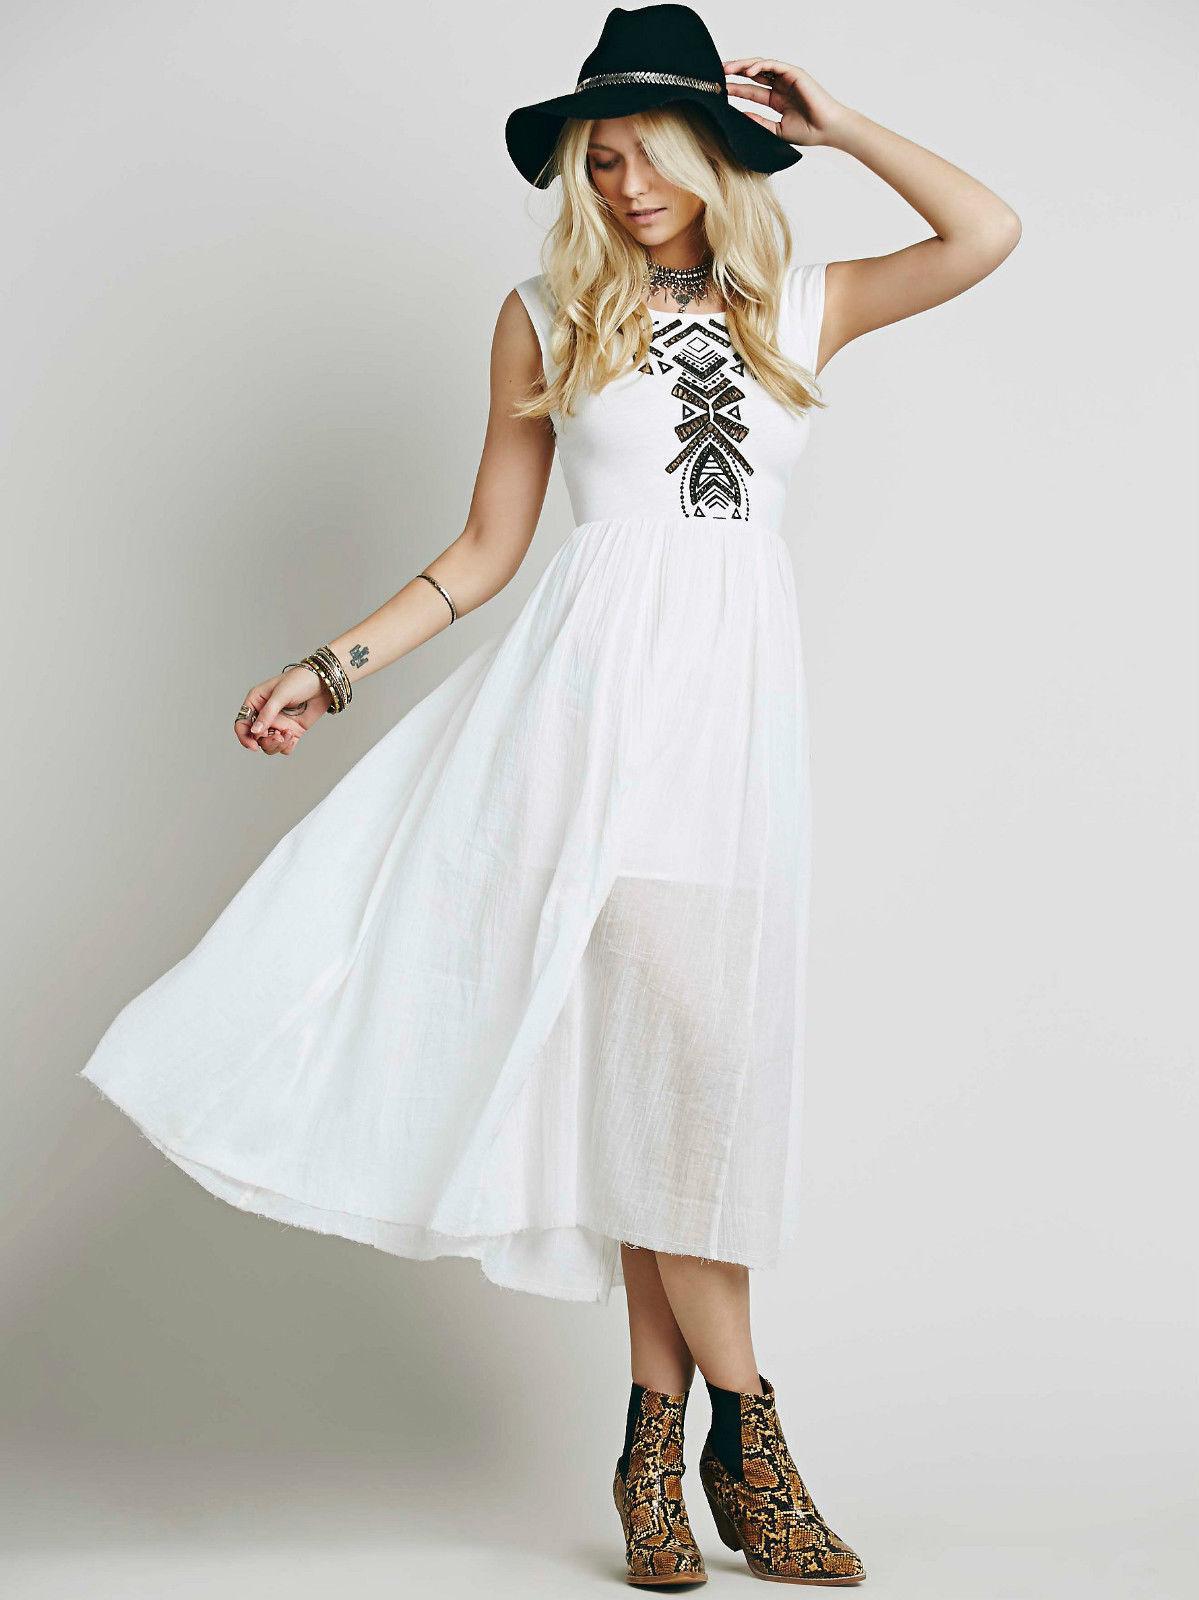 NEW FREE PEOPLE Toosaloosa Midi Embroidered Dress - S 8 10 - Summer Beach